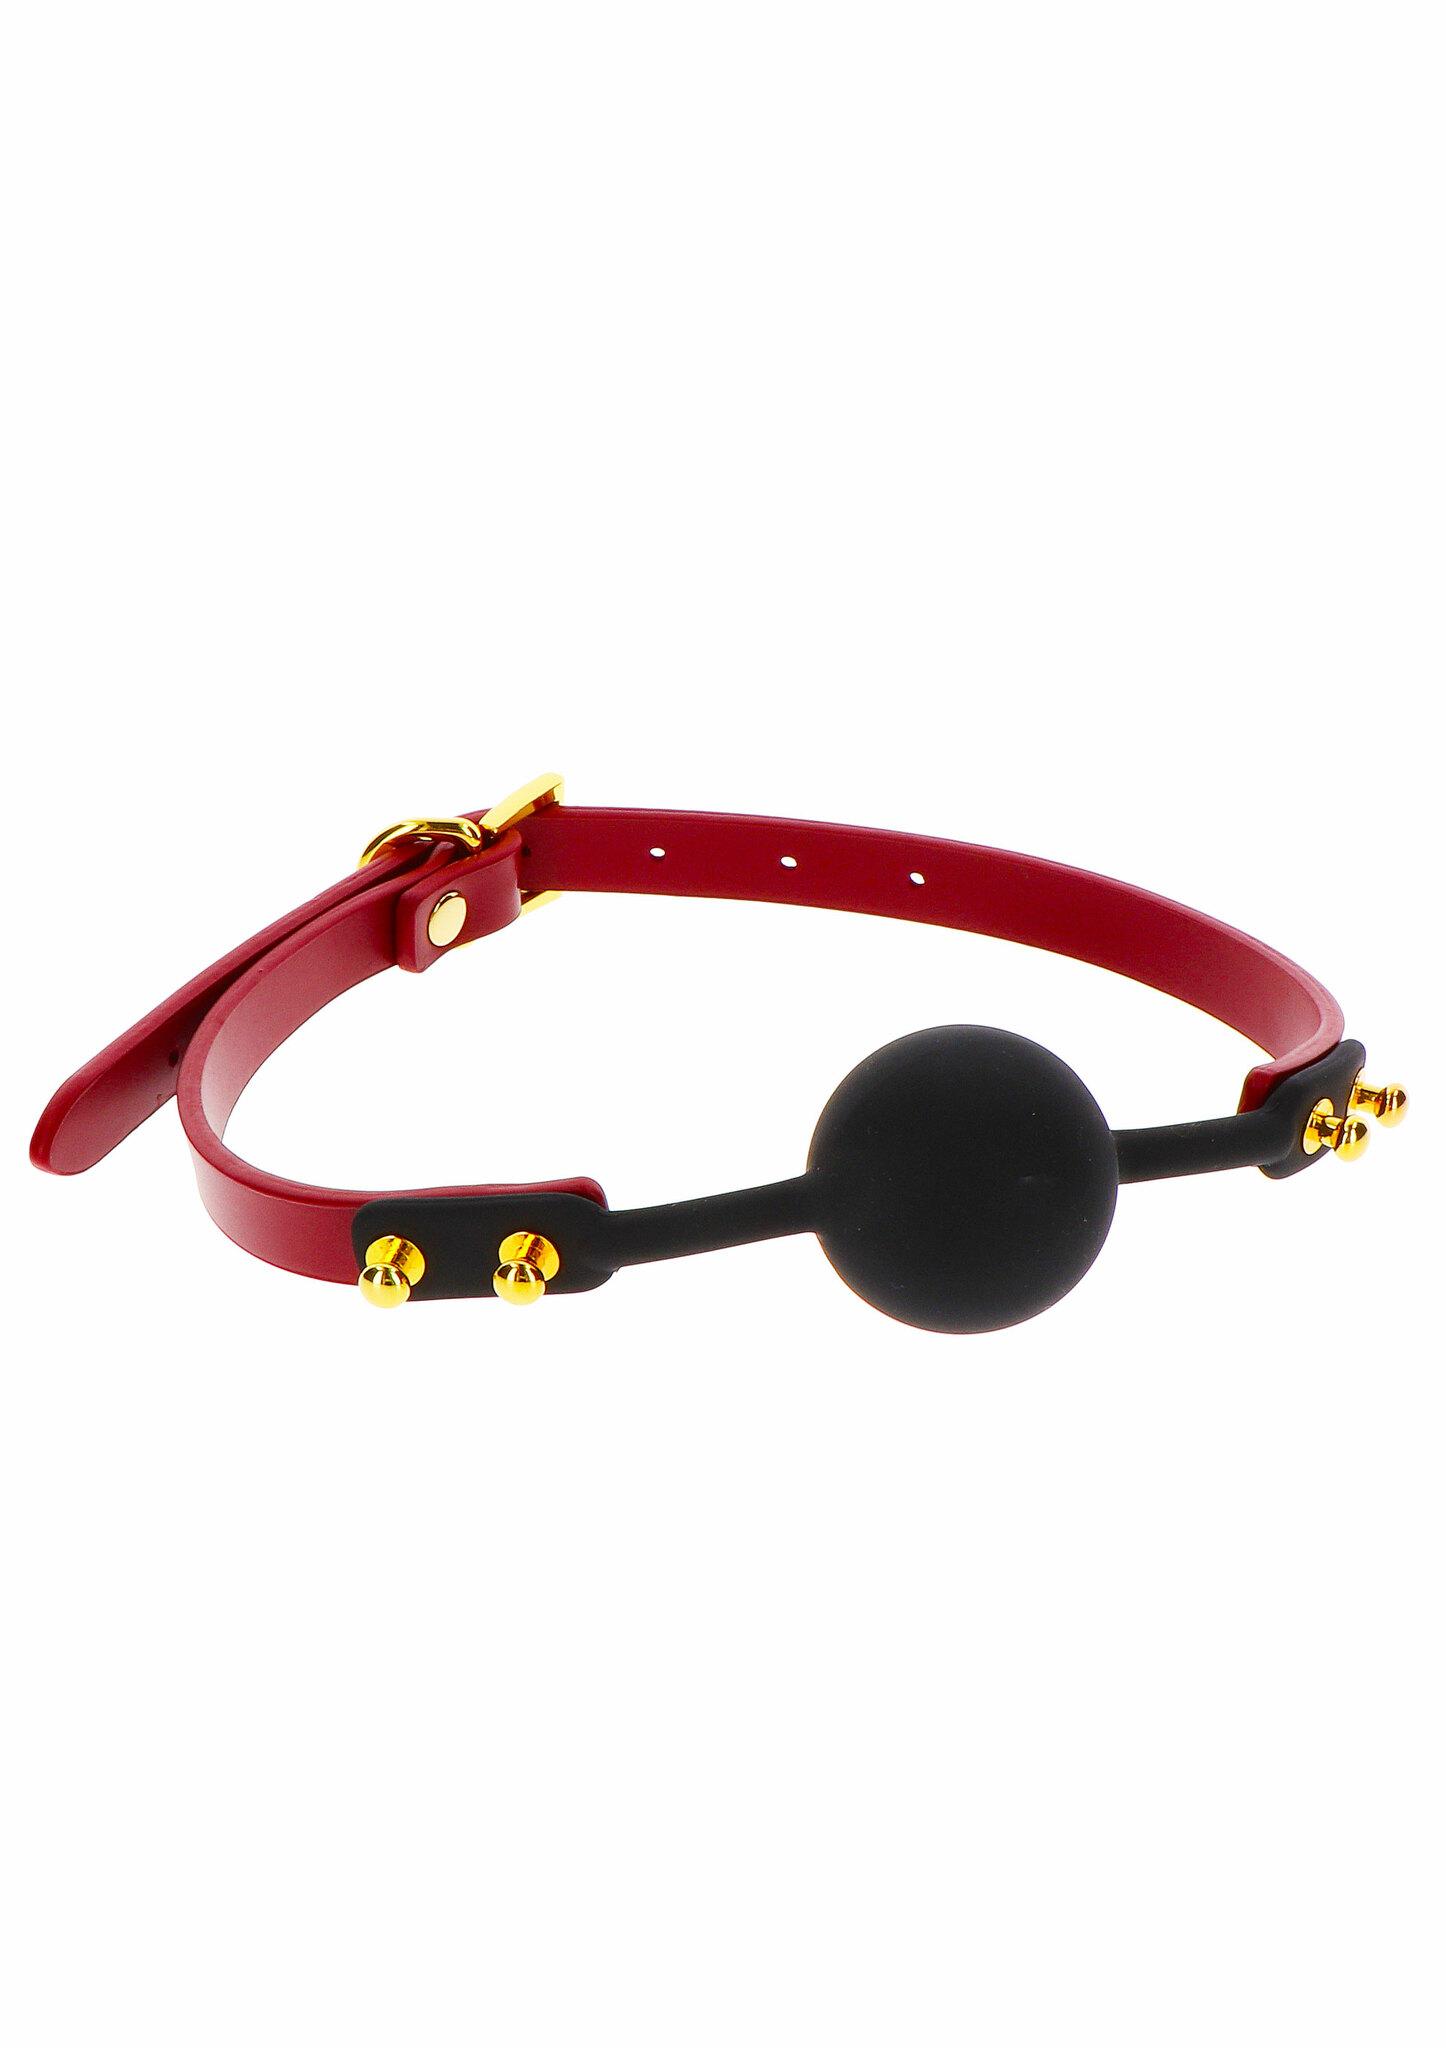 TABOOM - Silicone Ball Gag